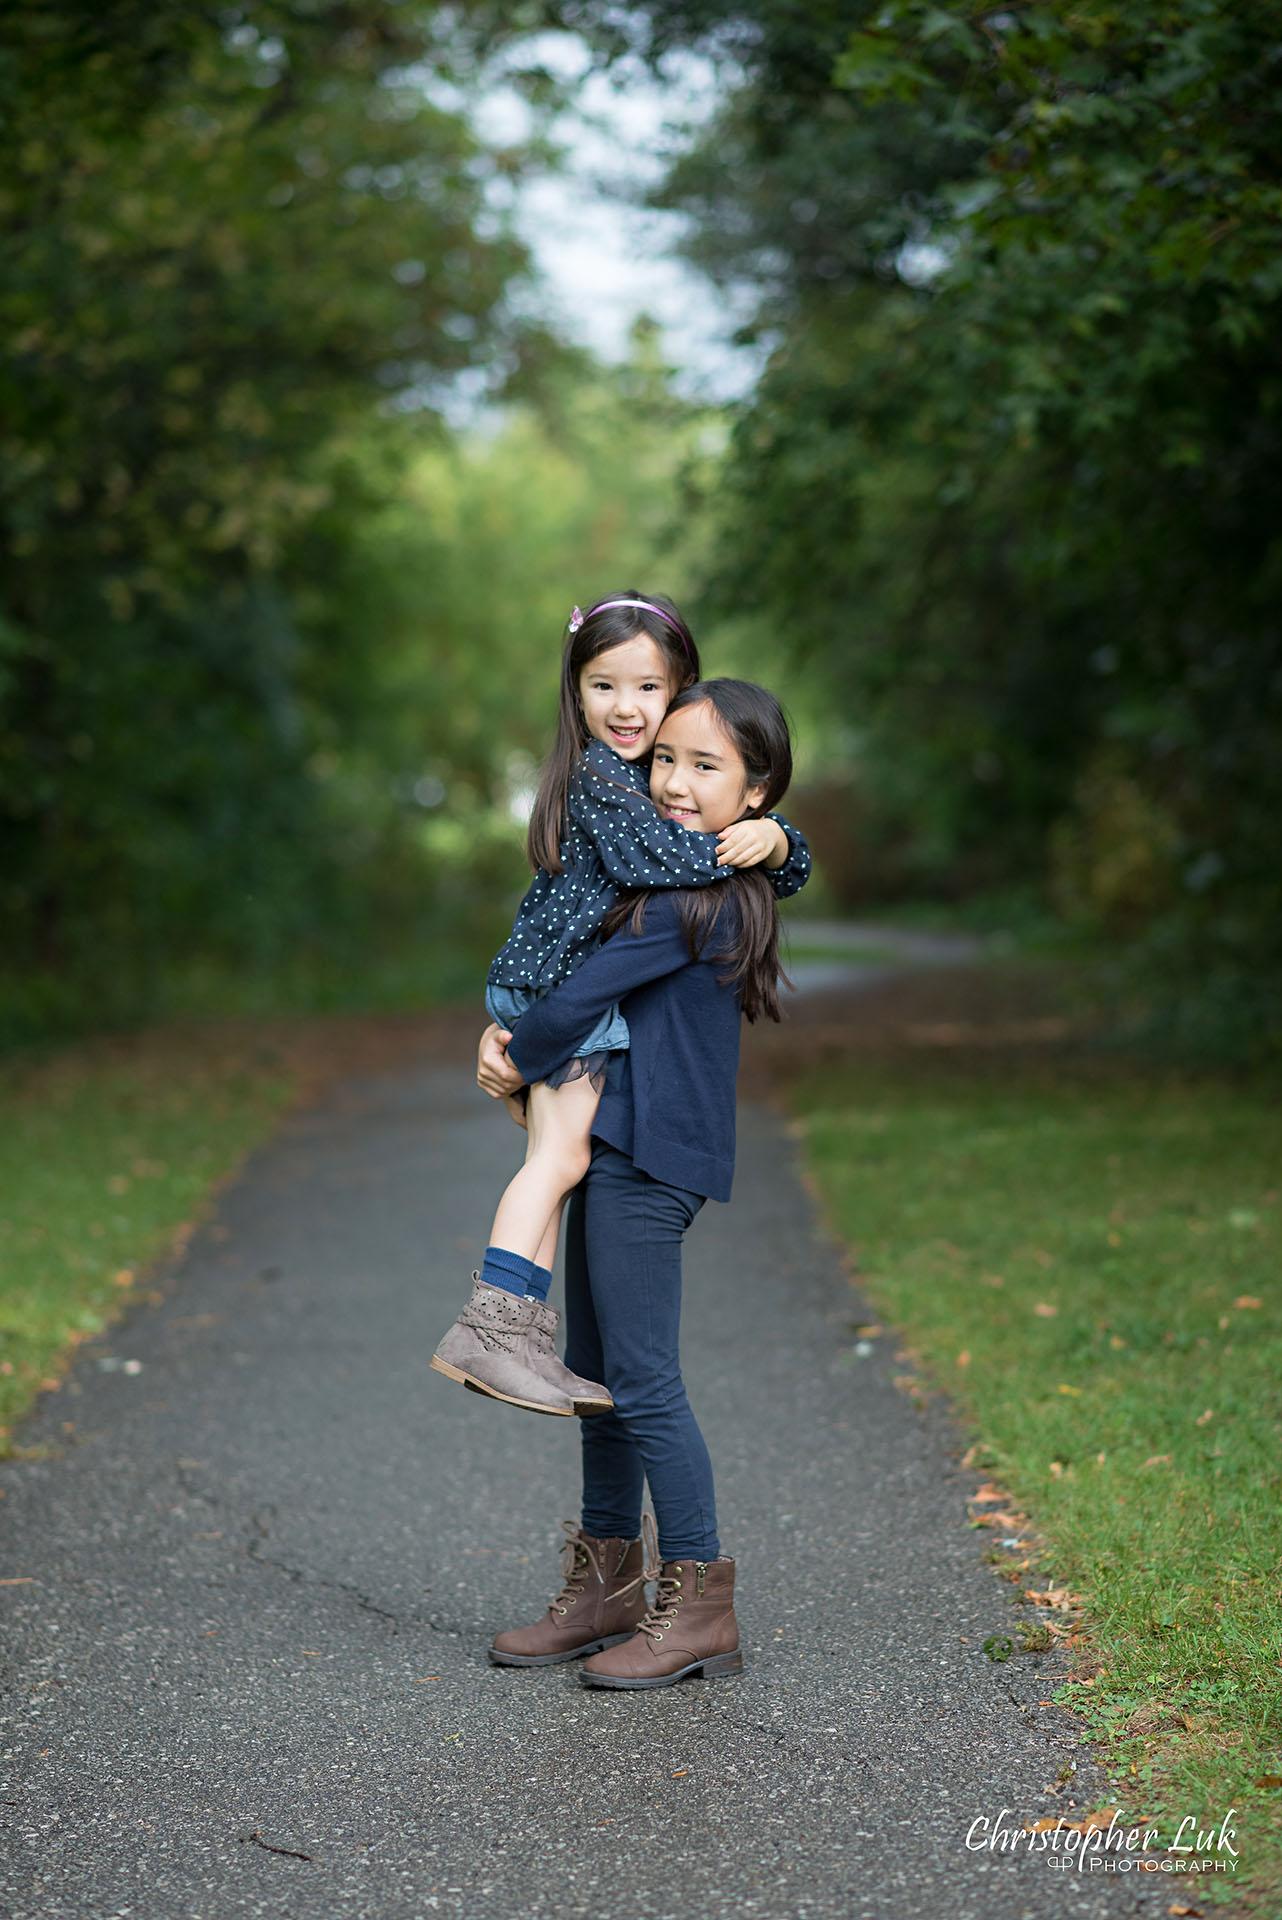 Christopher Luk Family Photographer Toronto Markham Candid Natural Photojournalistic Daughters Sisters Sisterhood Smile Hug Carry Lift Cute Adorable